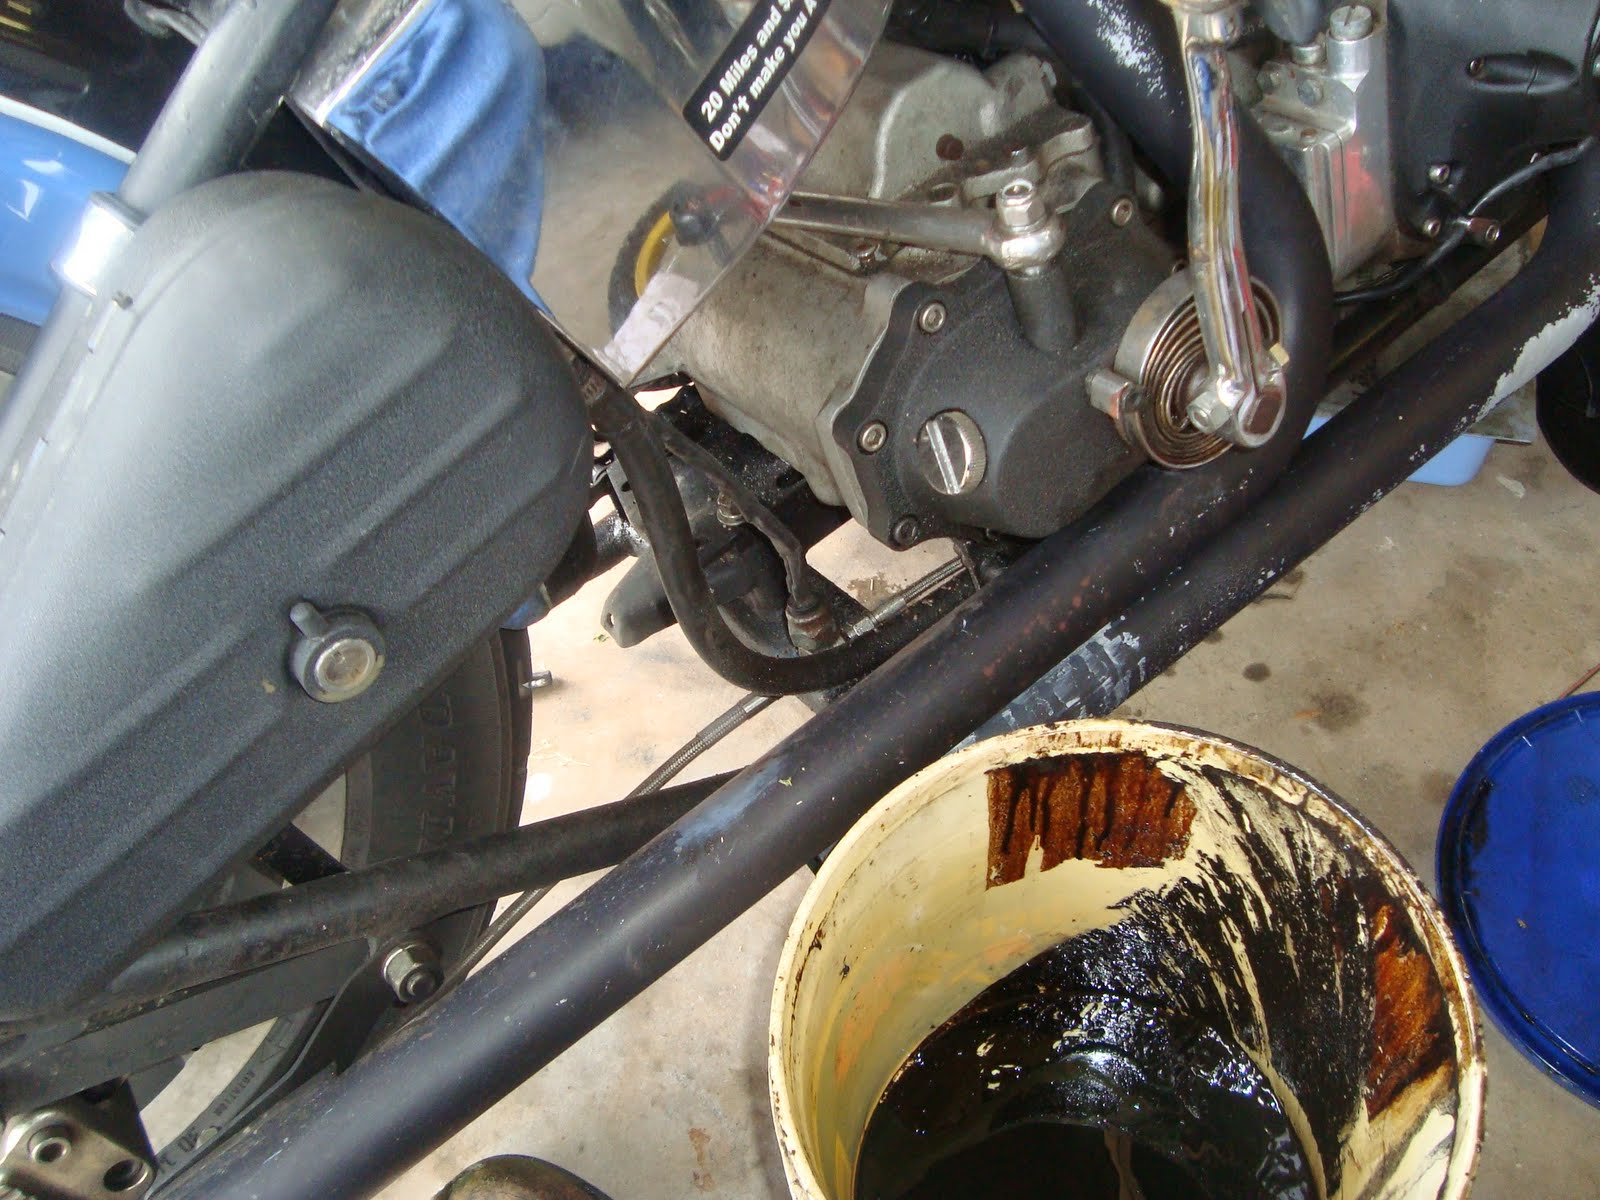 Tear it up, fix it, repeat: Shovelhead oil change